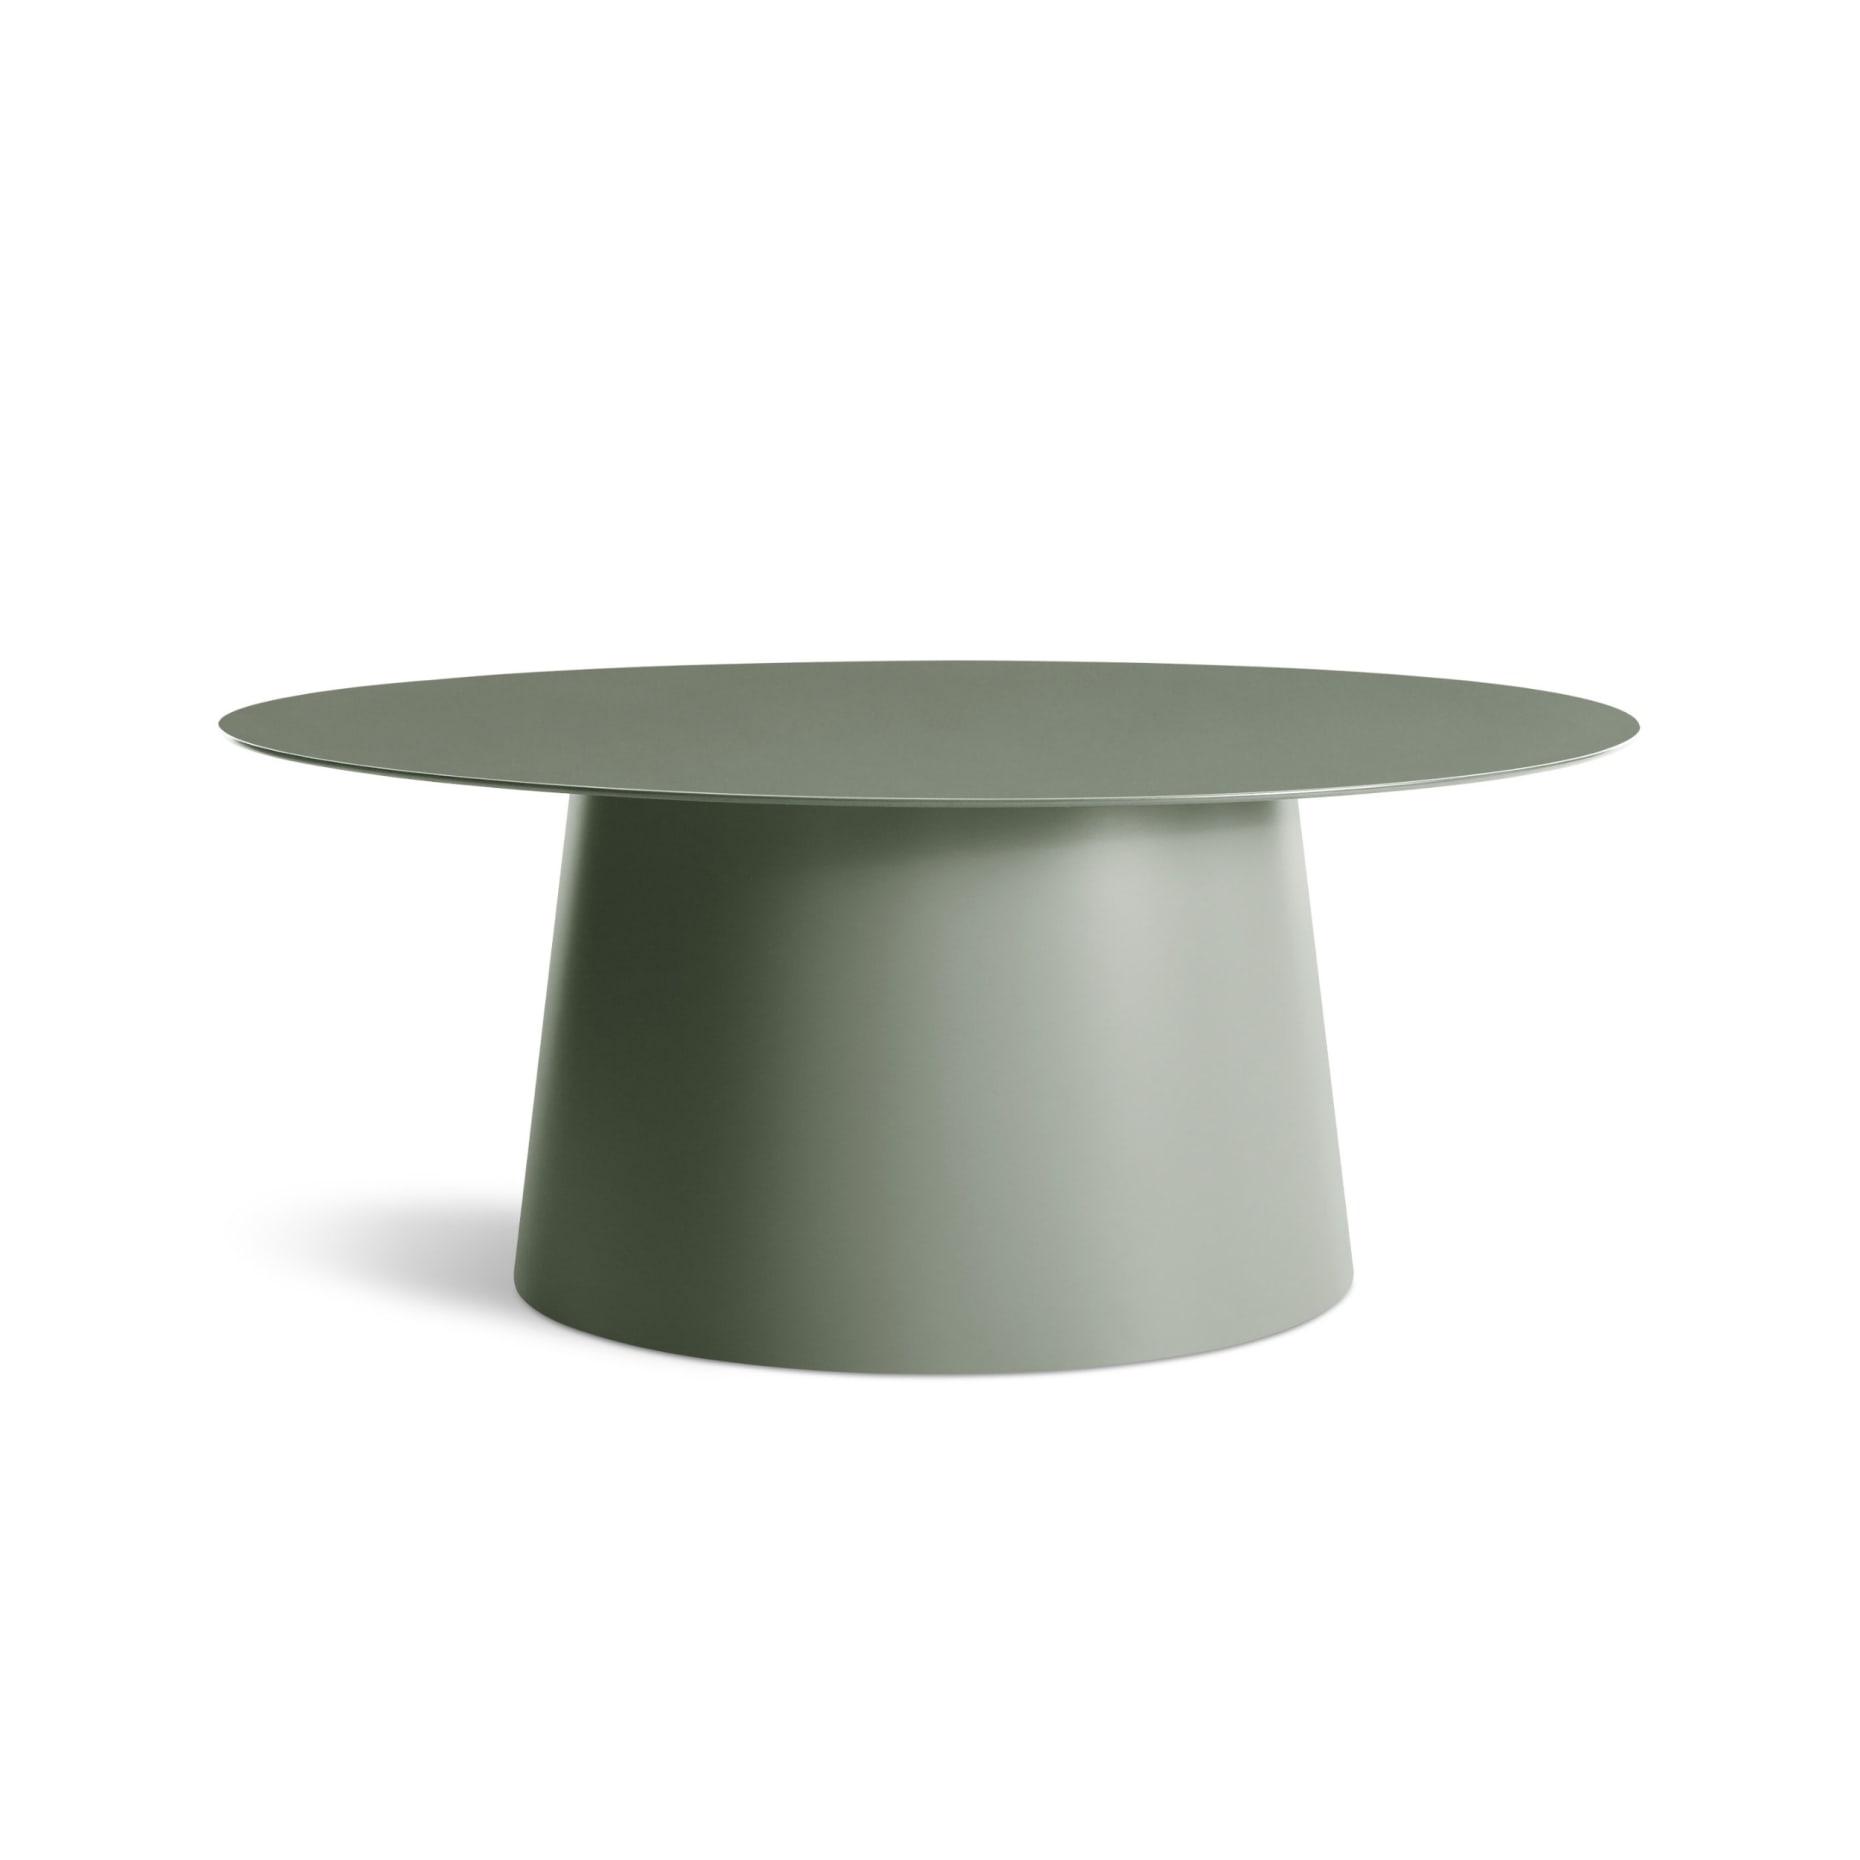 ci1_smcoff_gg_frontlow_v2-circula-small-coffee-table-grey-green_1